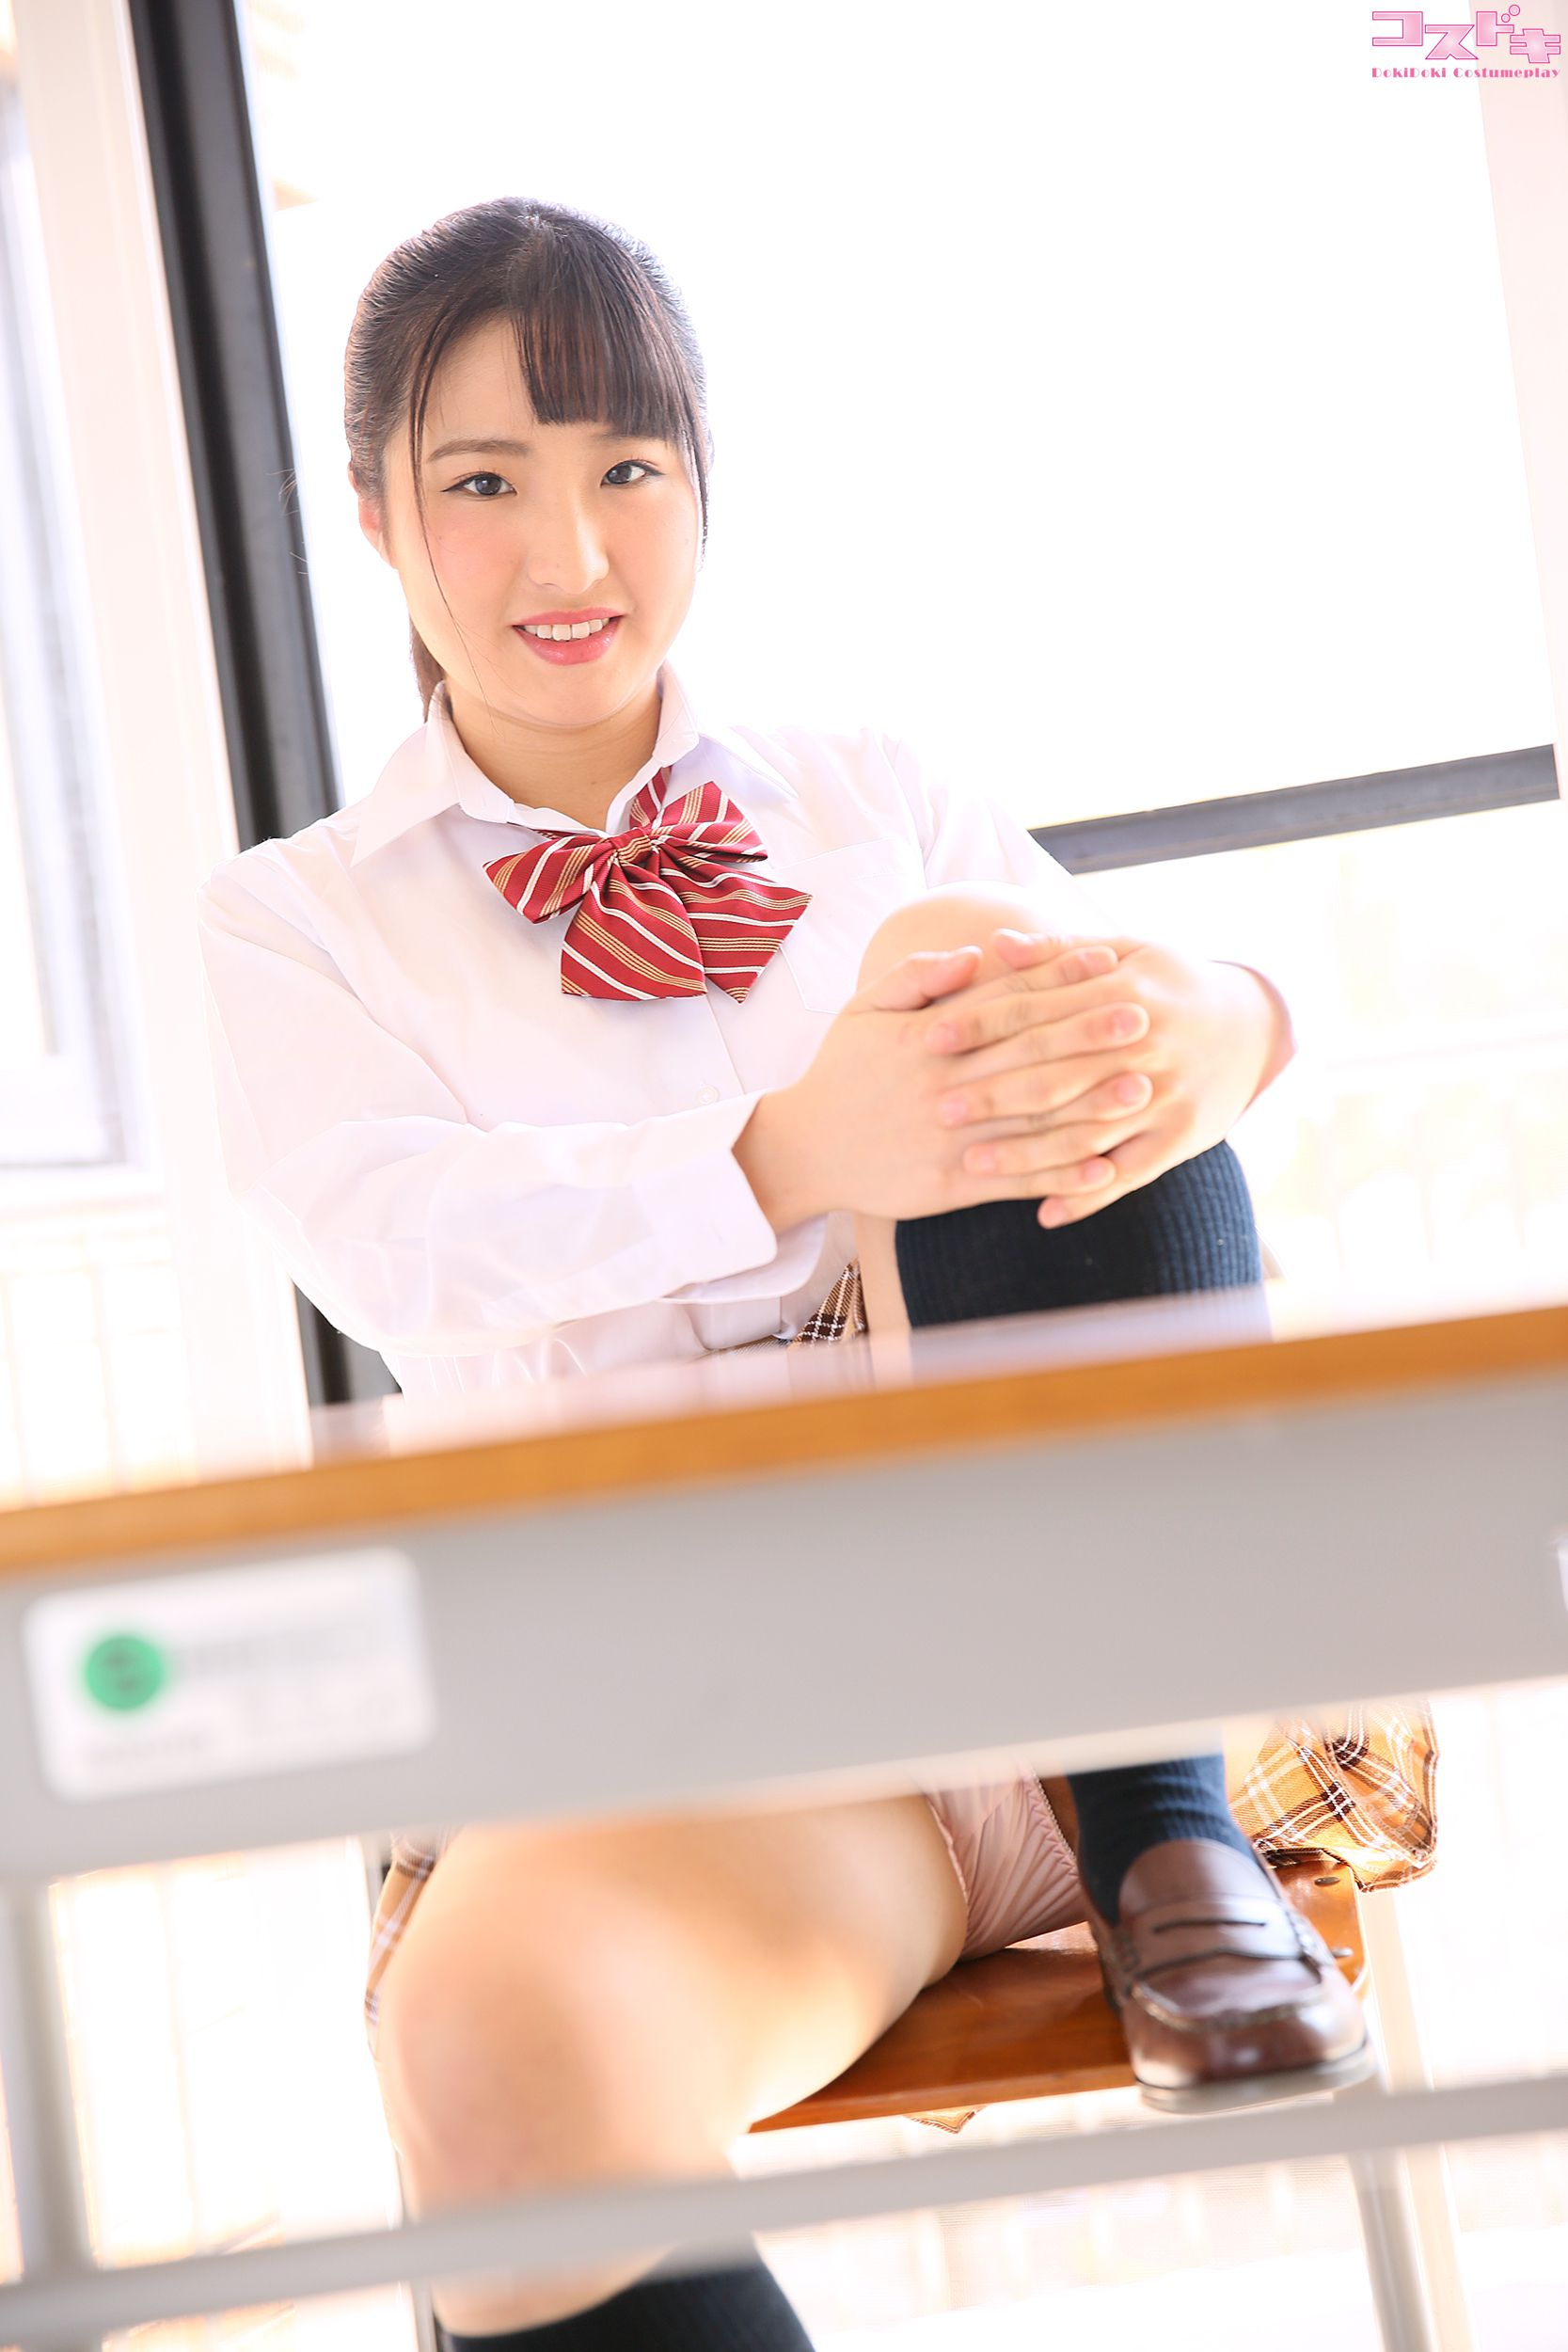 VOL.264 [Cosdoki]学生制服:宝生美亚(宝生美亜)超高清写真套图(48P)